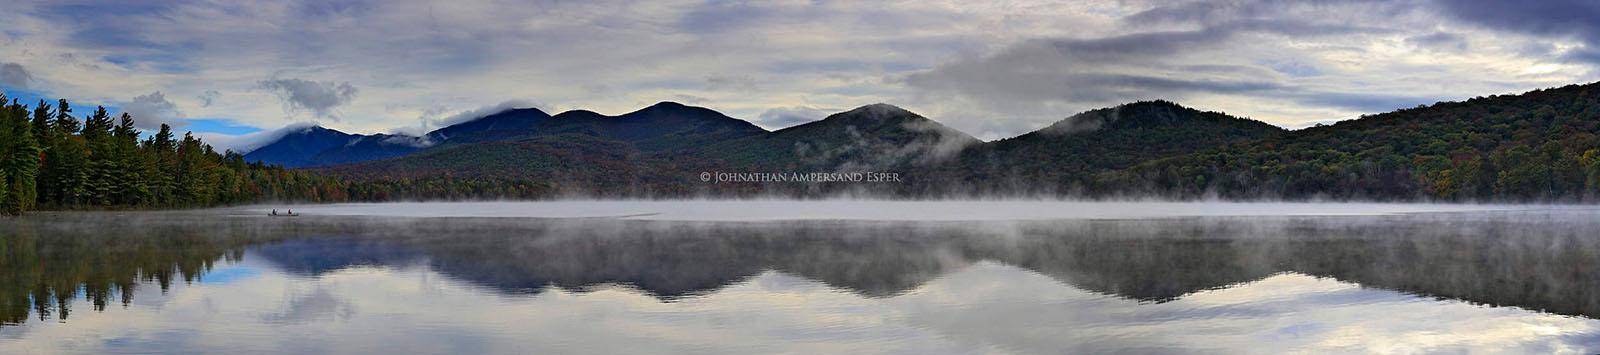 canoeist,canoeing,Clear Pond,Elk Lake Preserve,reflection,panorama,Adirondack Mountains,Adirondack Park,Johnathan Esper, photo